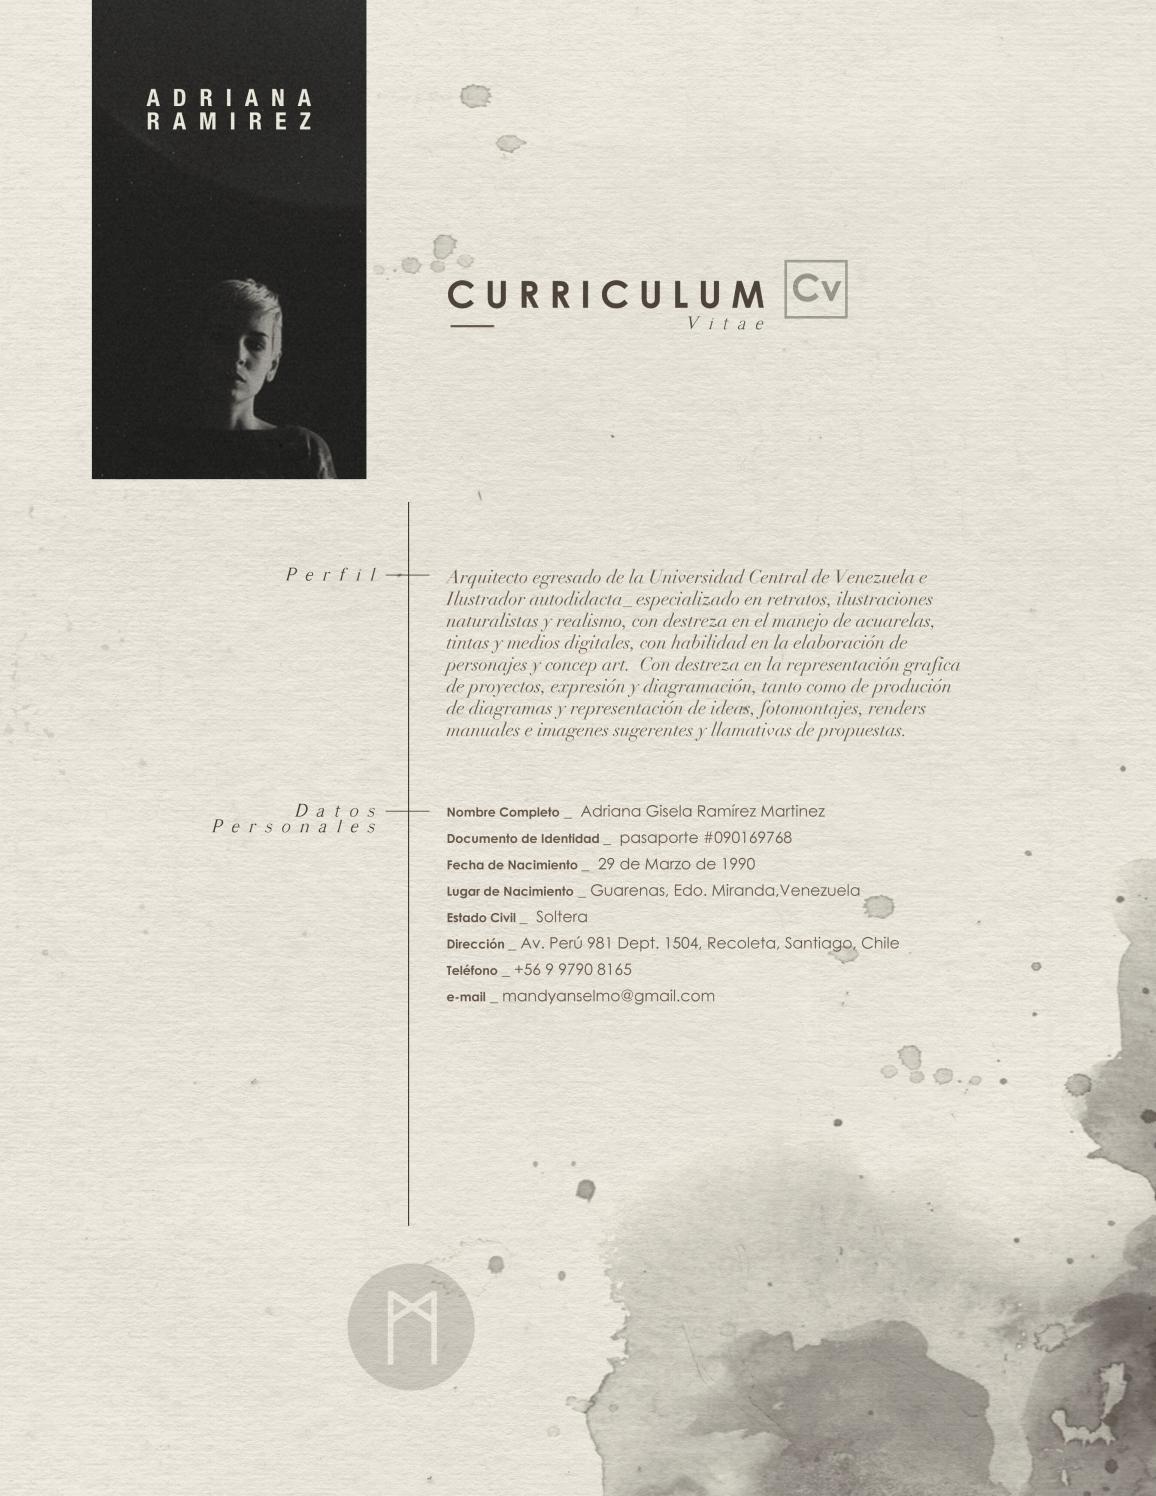 Curriculum Vitae 2018 By Mandy Anselmo Issuu